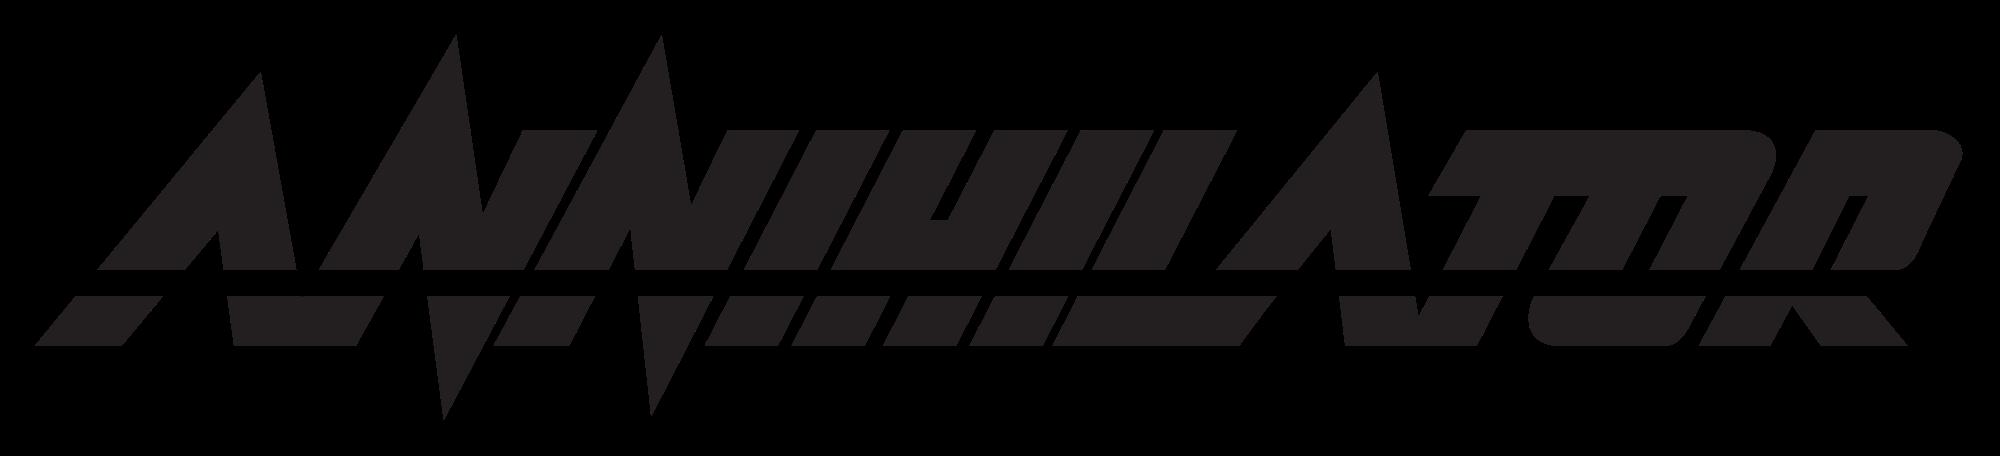 Annihilator Logo Vector PNG